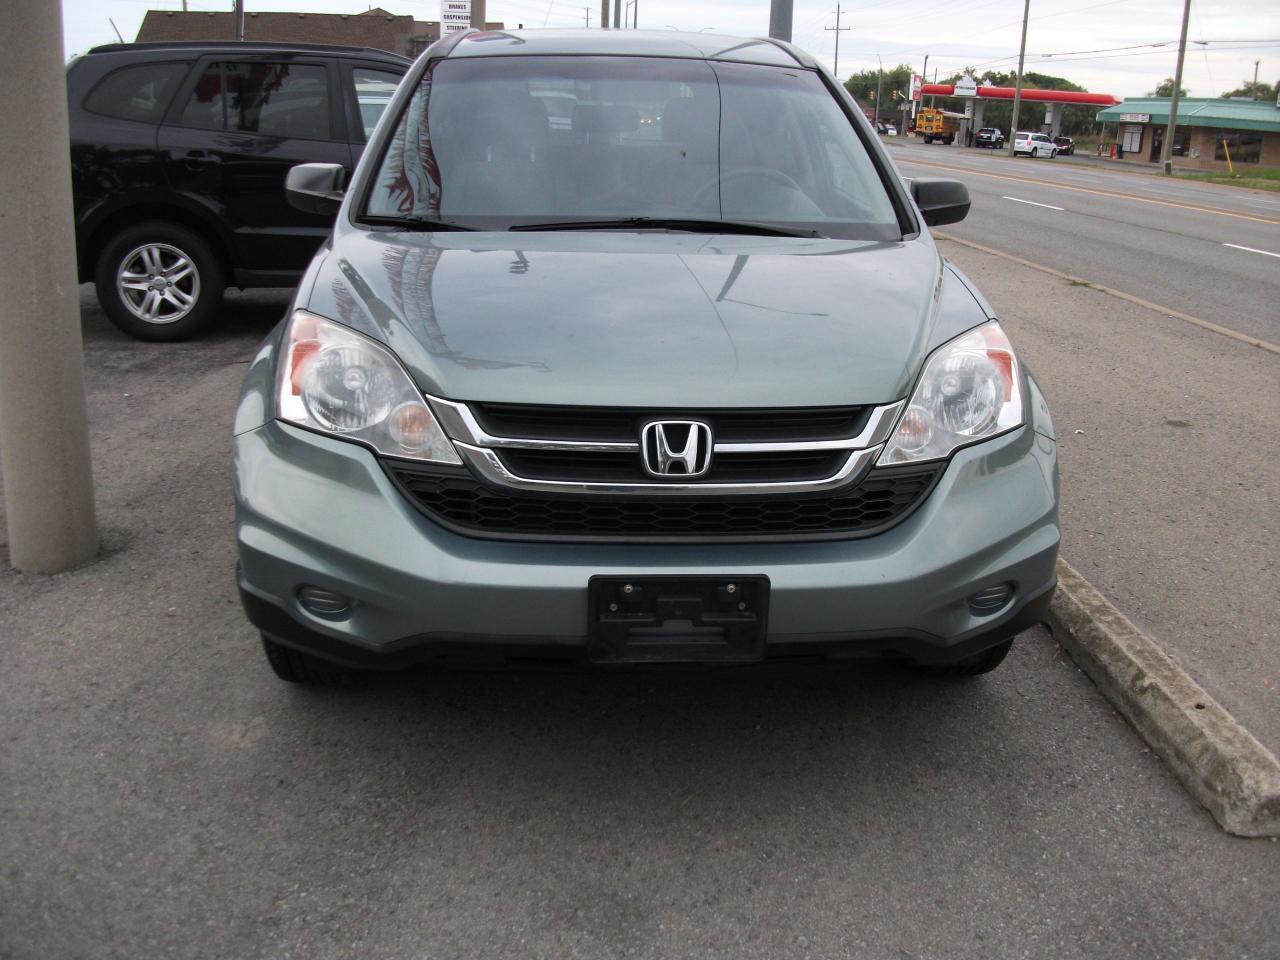 Photo of Green 2010 Honda CR-V